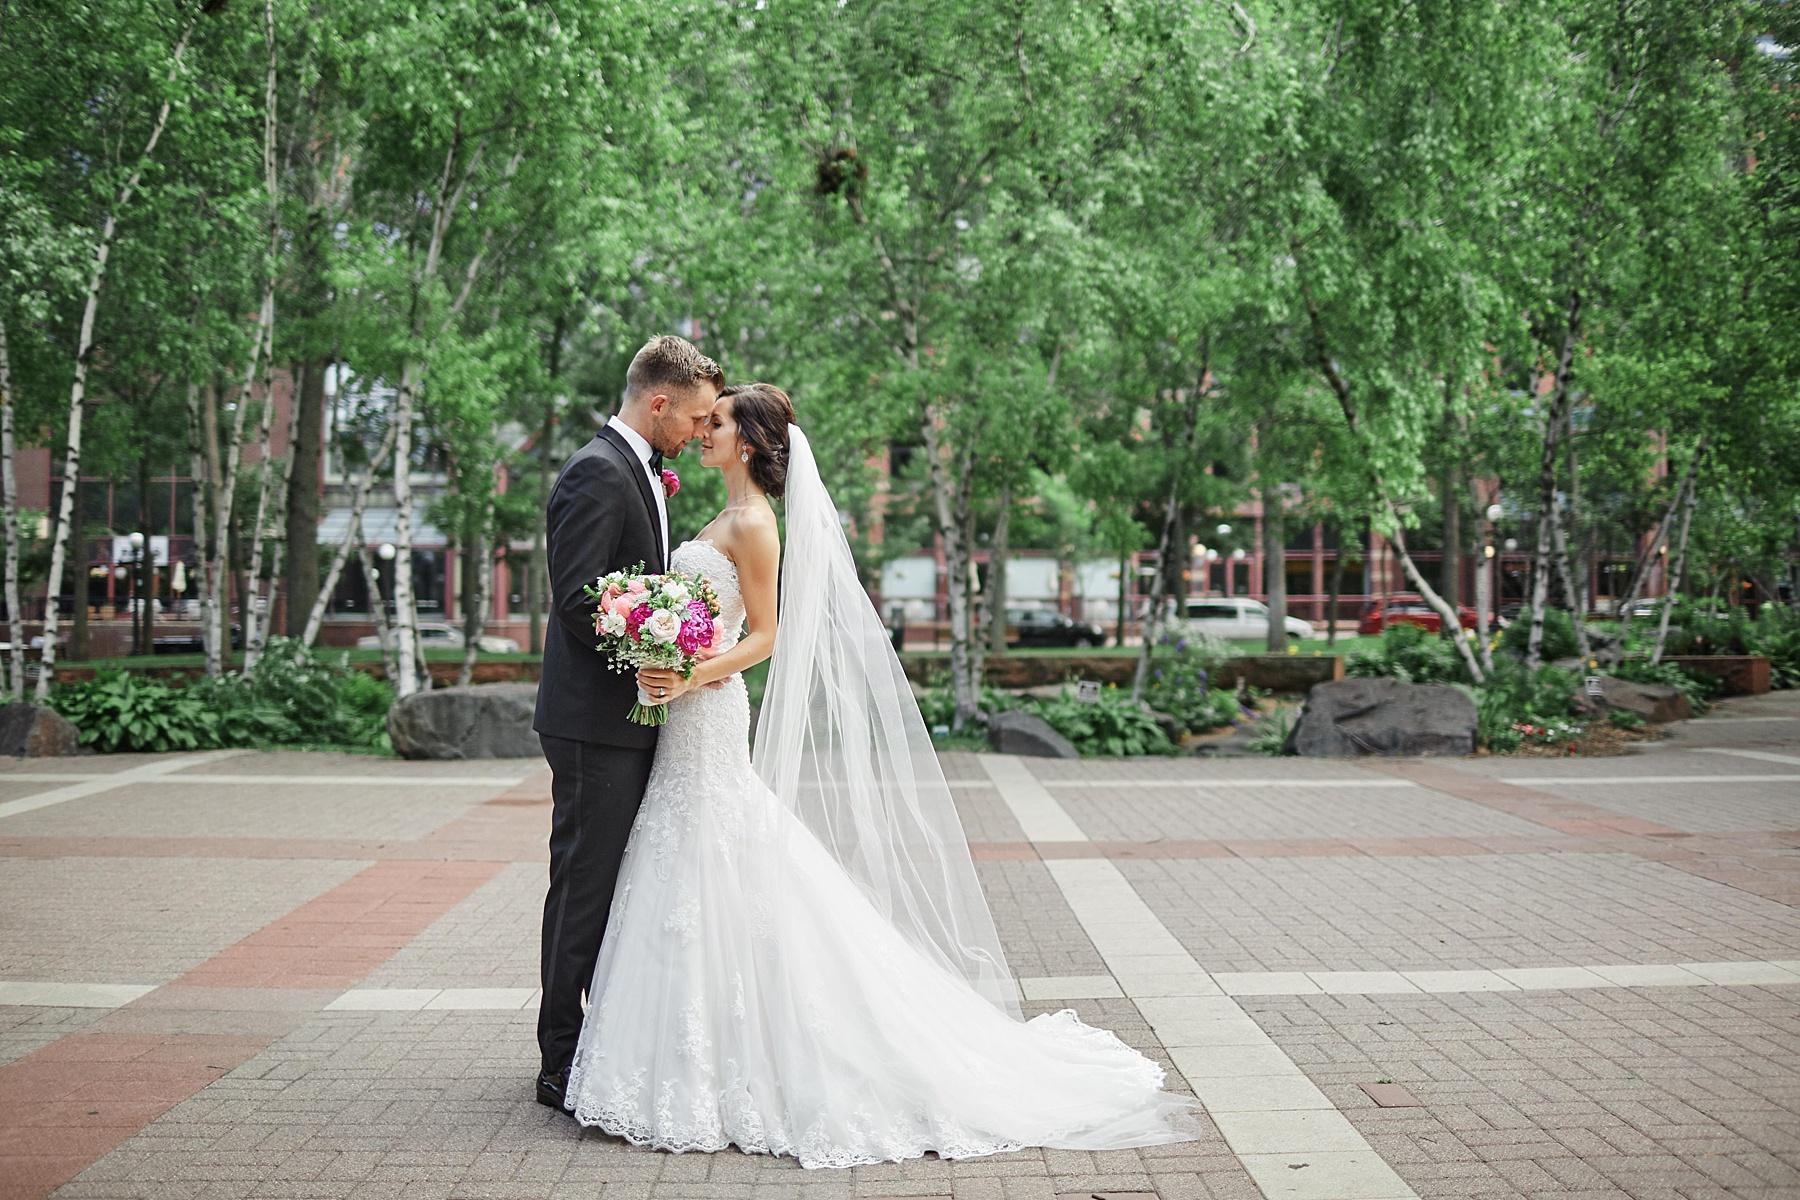 ABULAE-Wedding-Saint-paul-MN-Josh-Sofia-Wedding-Mears-Park_0785.jpg